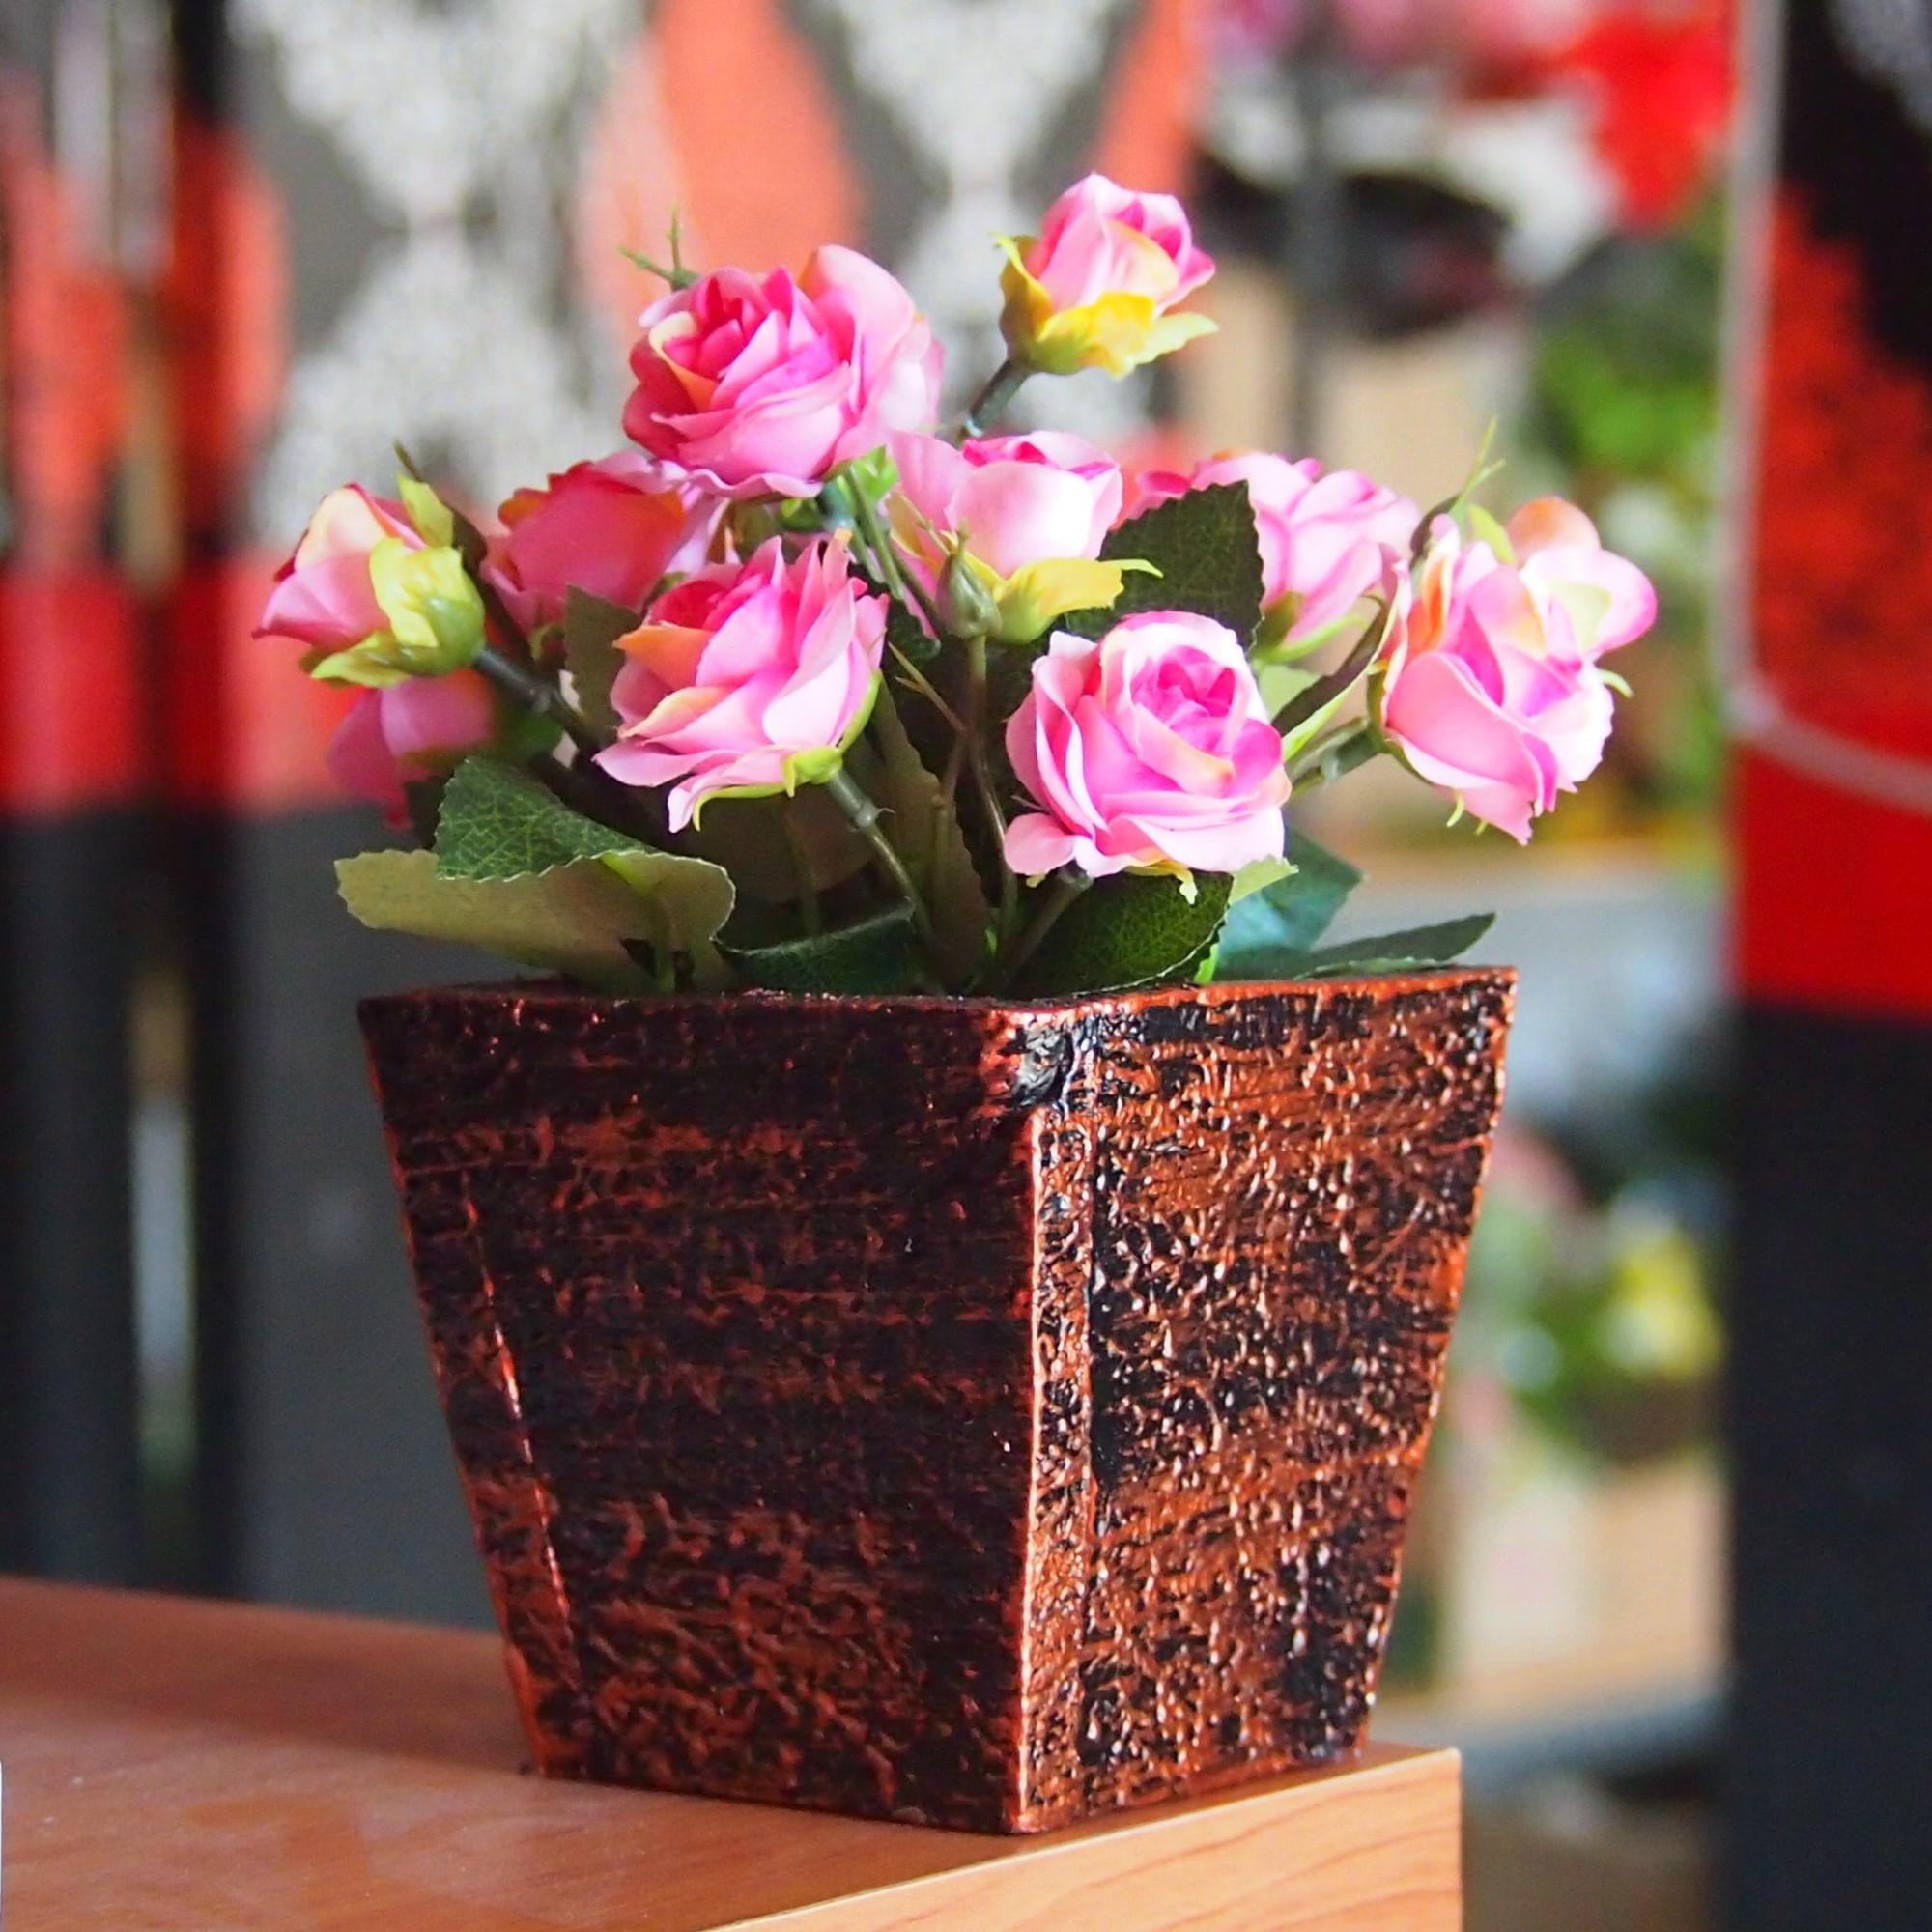 Bunga Hiasan Meja Dan Rumah - Bunga Artificial - Bunga Rangkai Rose Pot Kayu 98fcb22927